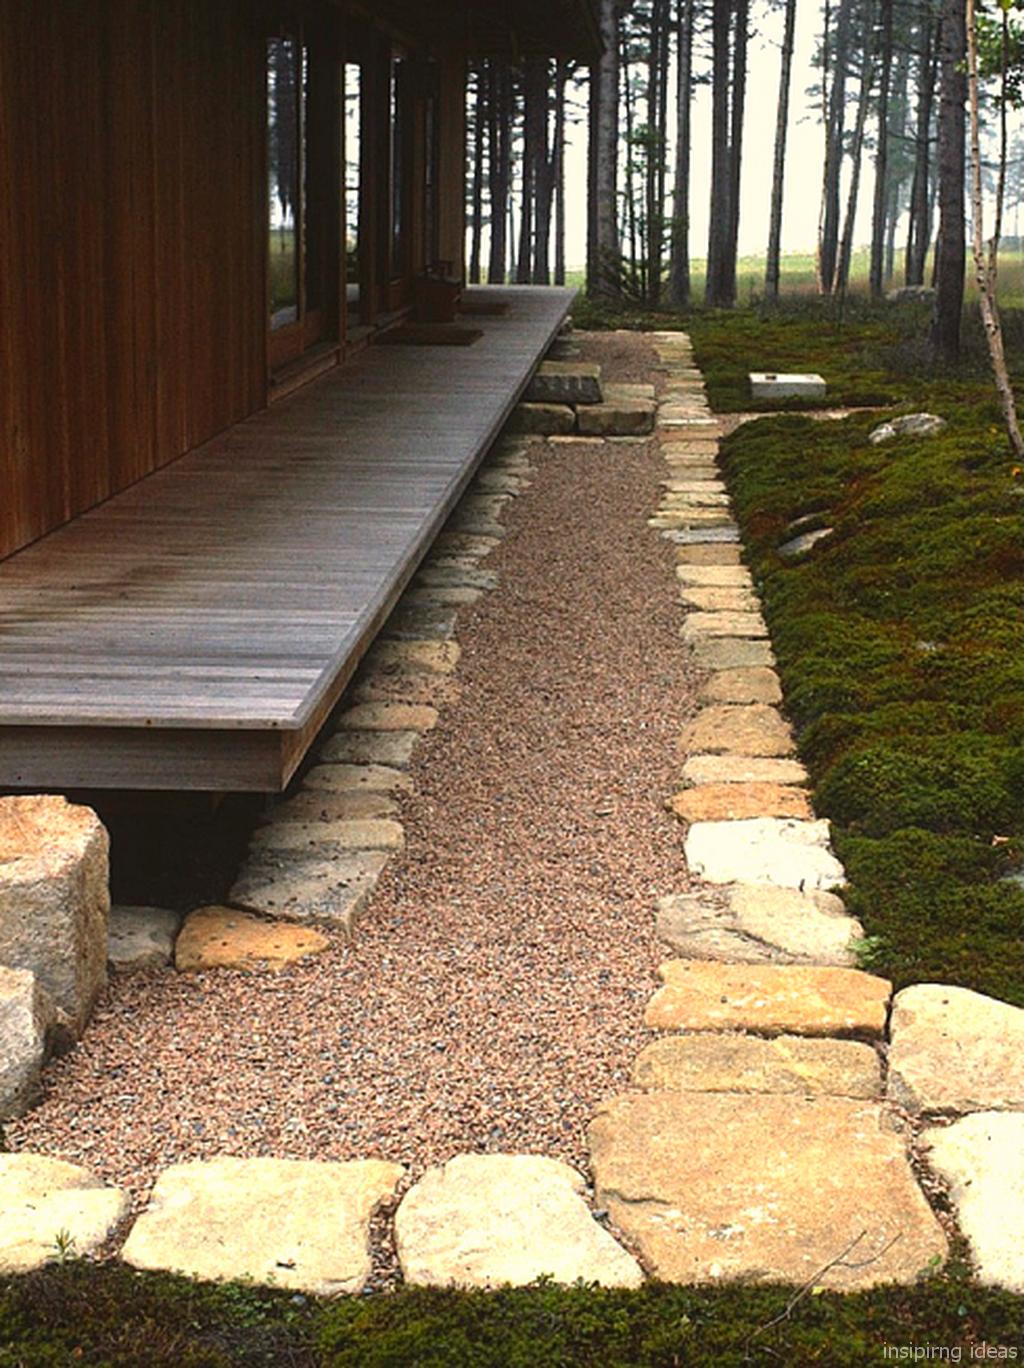 adorable 150 beautiful gravel patio design ideas https on extraordinary garden stone pathway ideas to copy id=59672